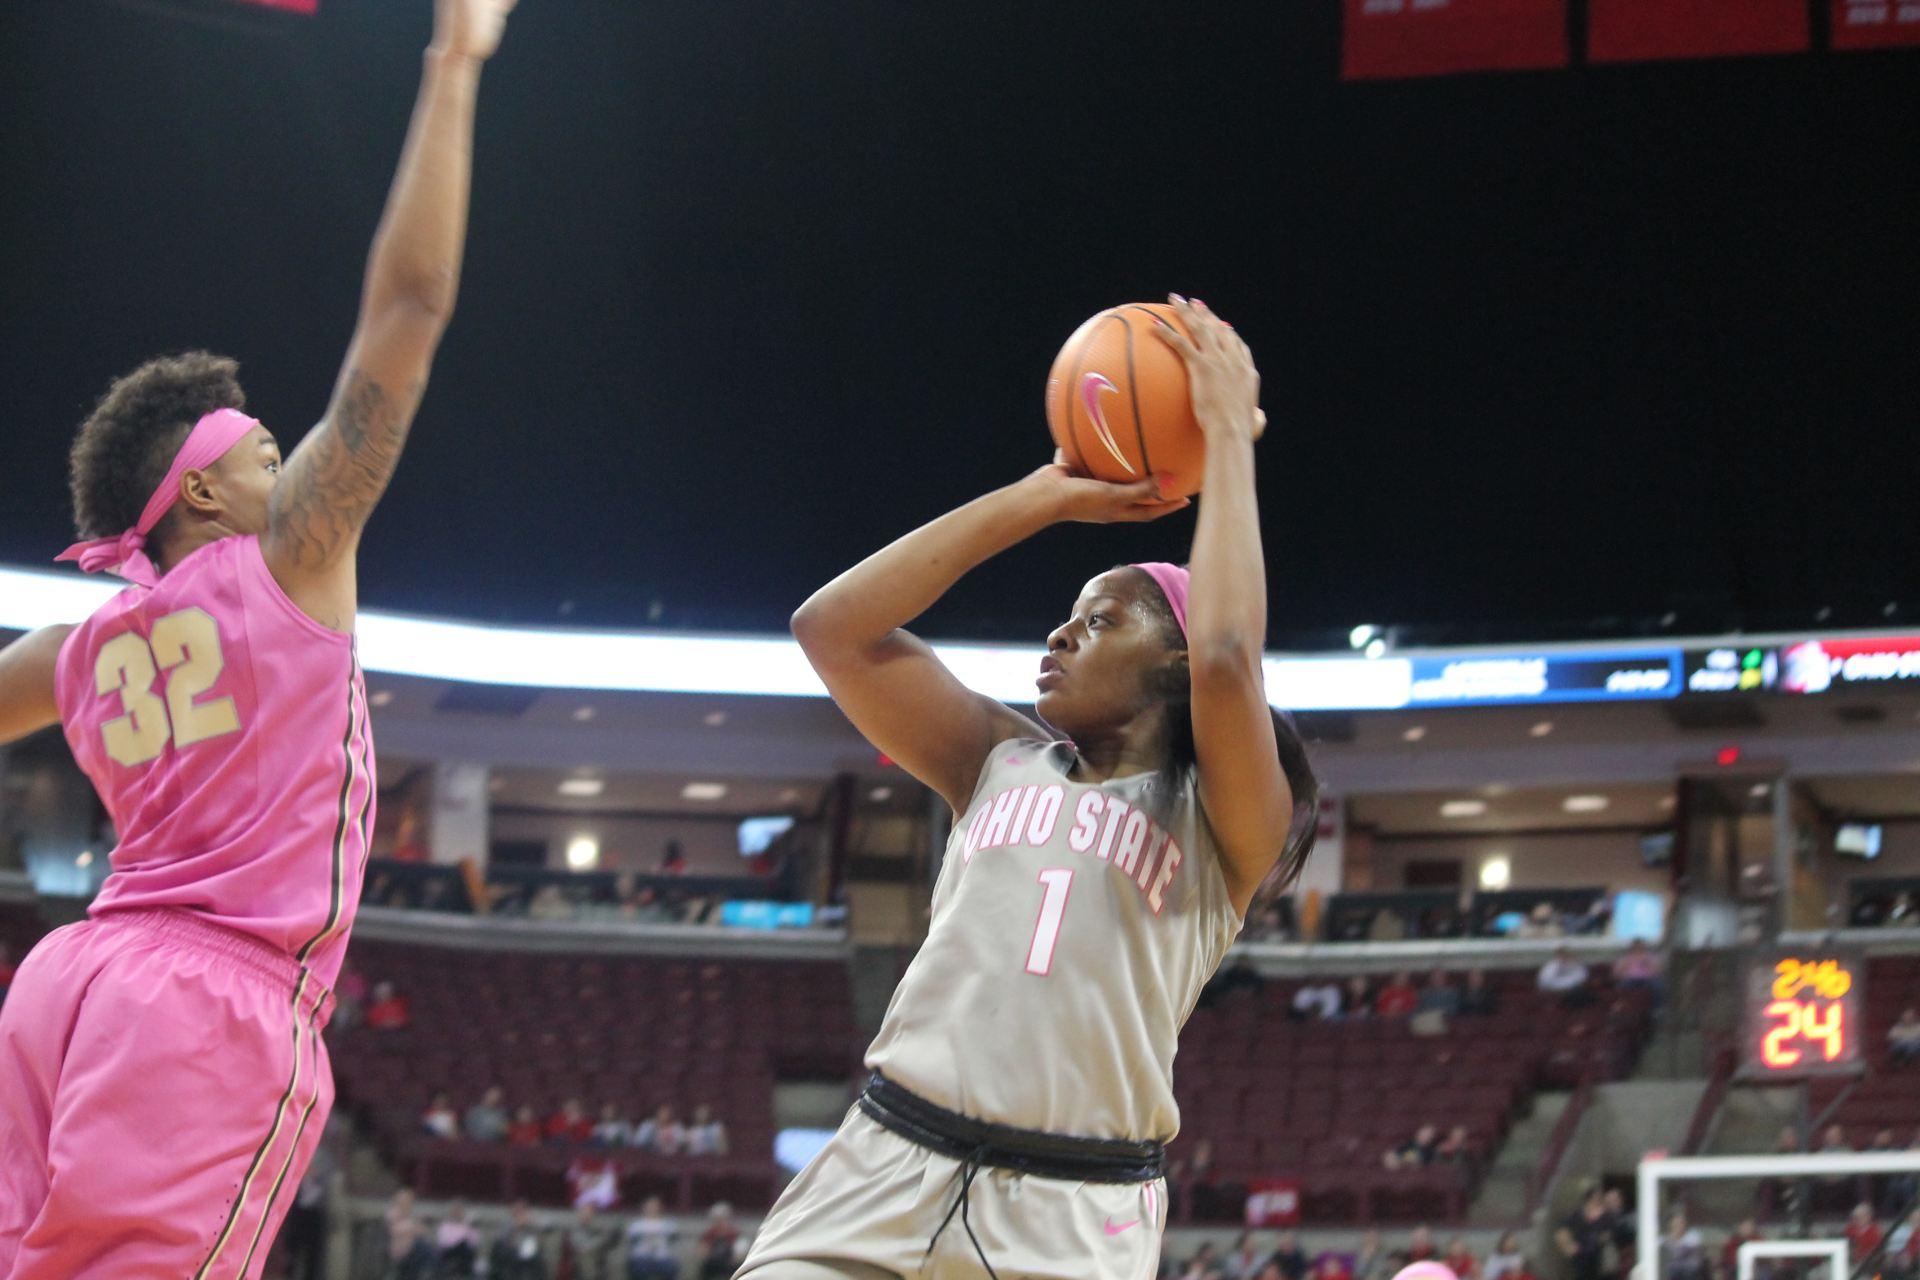 Women's Basketball: No. 3 Ohio State cruises to 87-45 win against No. 14 George Washington, advances to second round